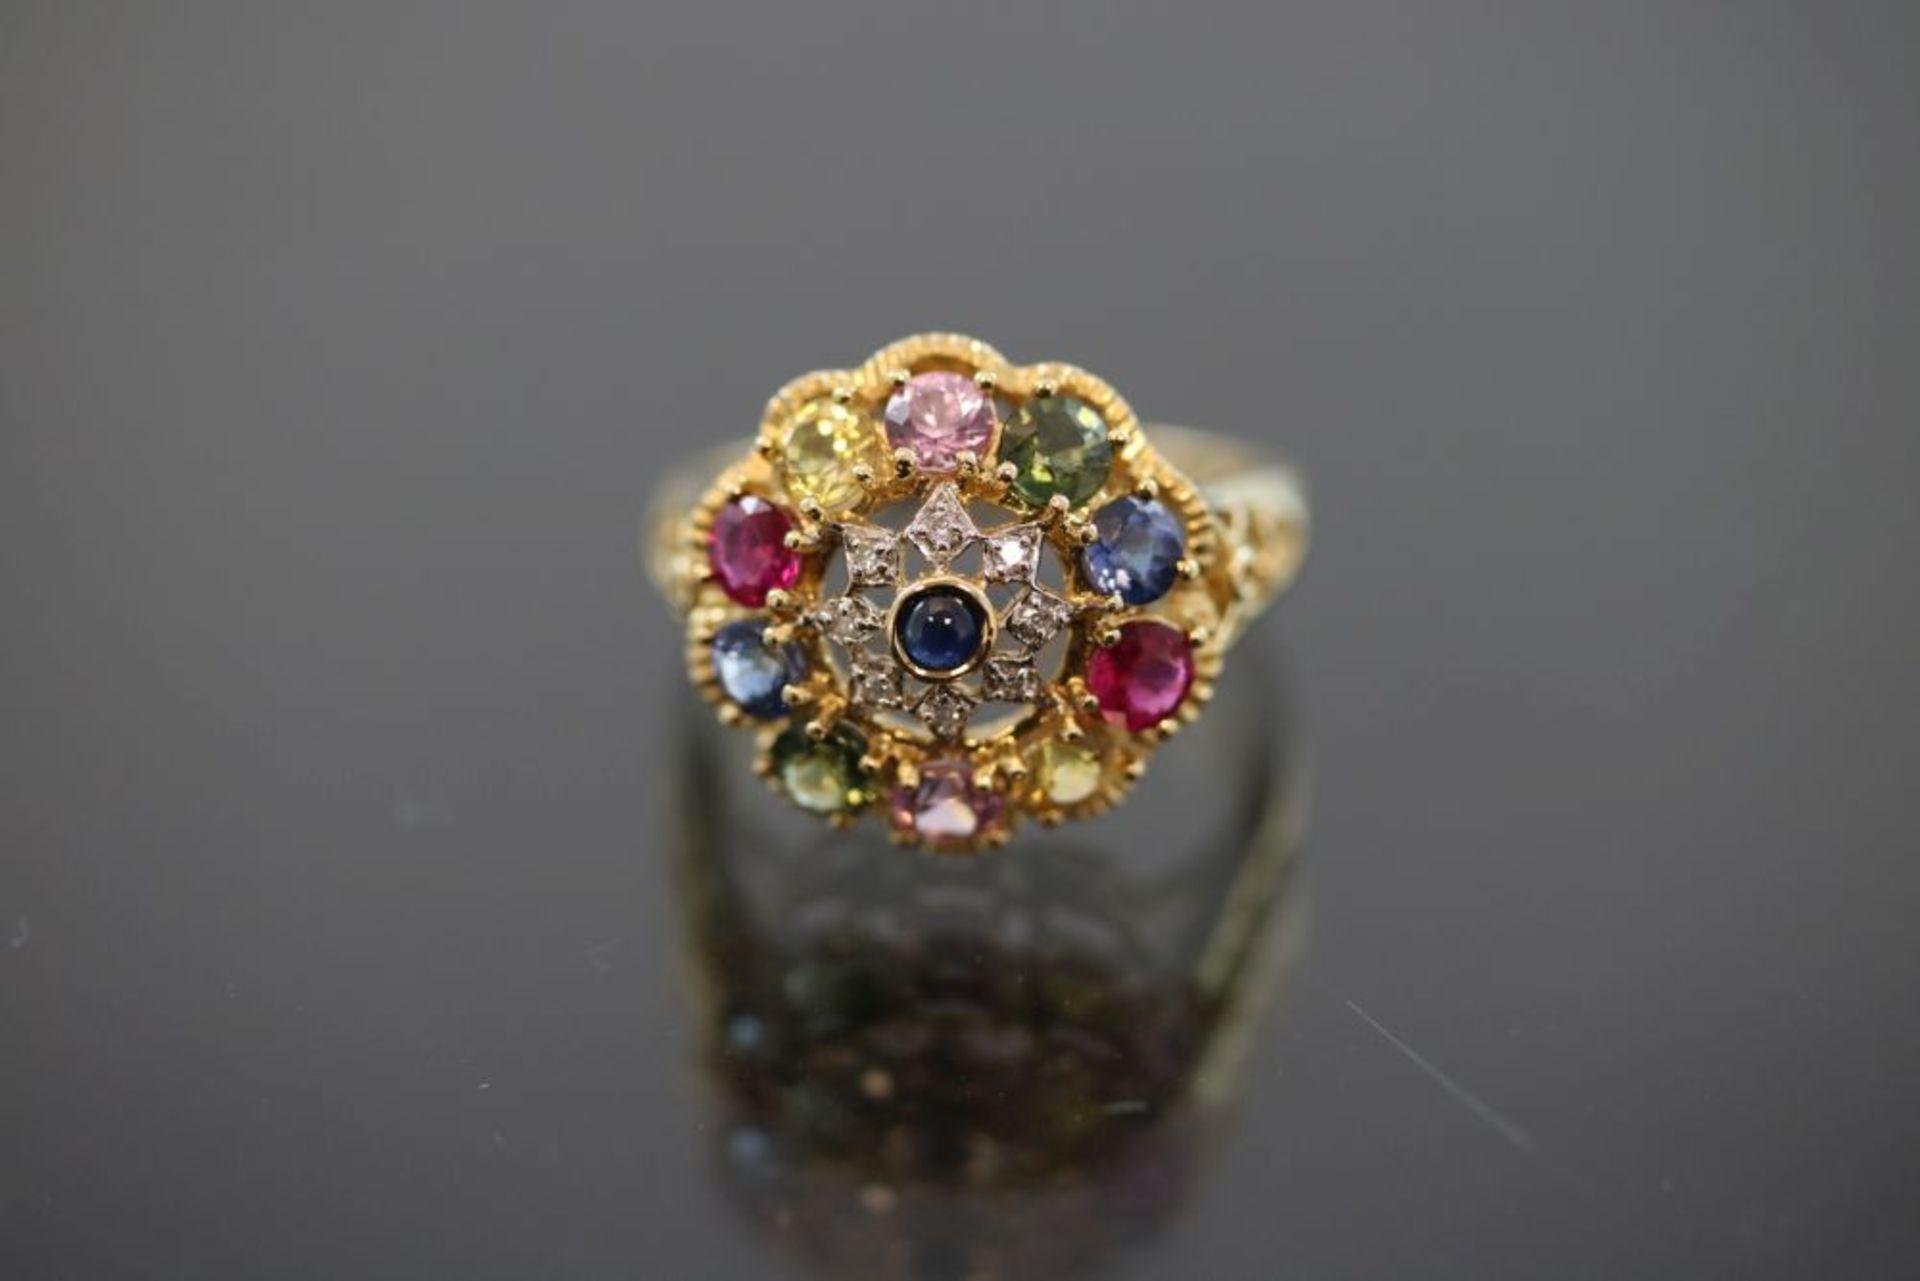 Edelstein-Ring, 750 Gold